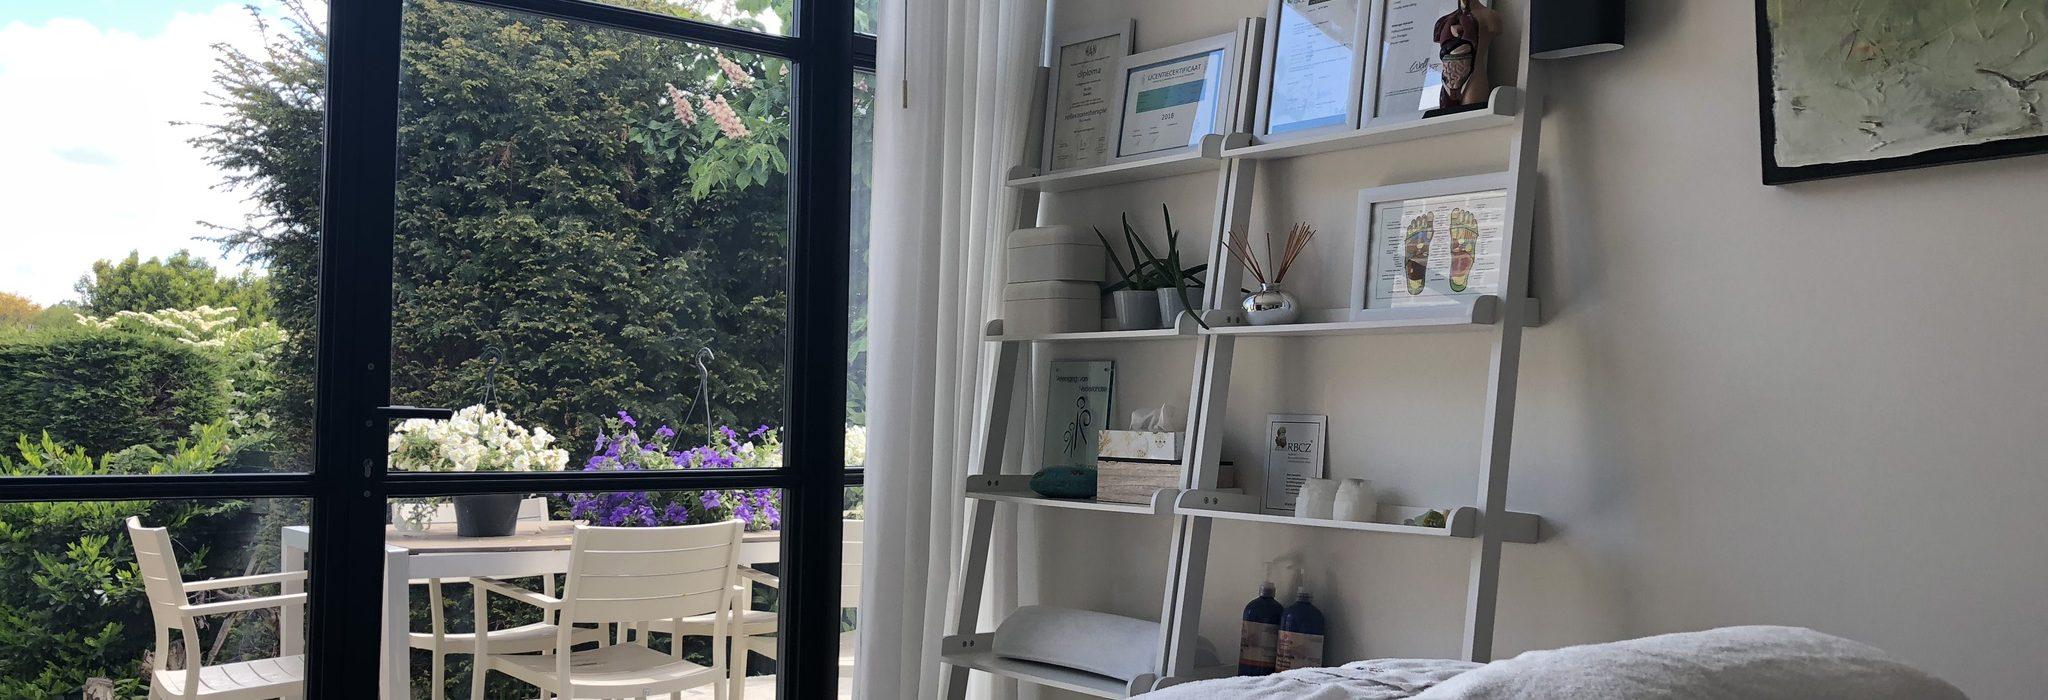 Praktijkruimte Jessica Raven WellJess massage Oostvoorne